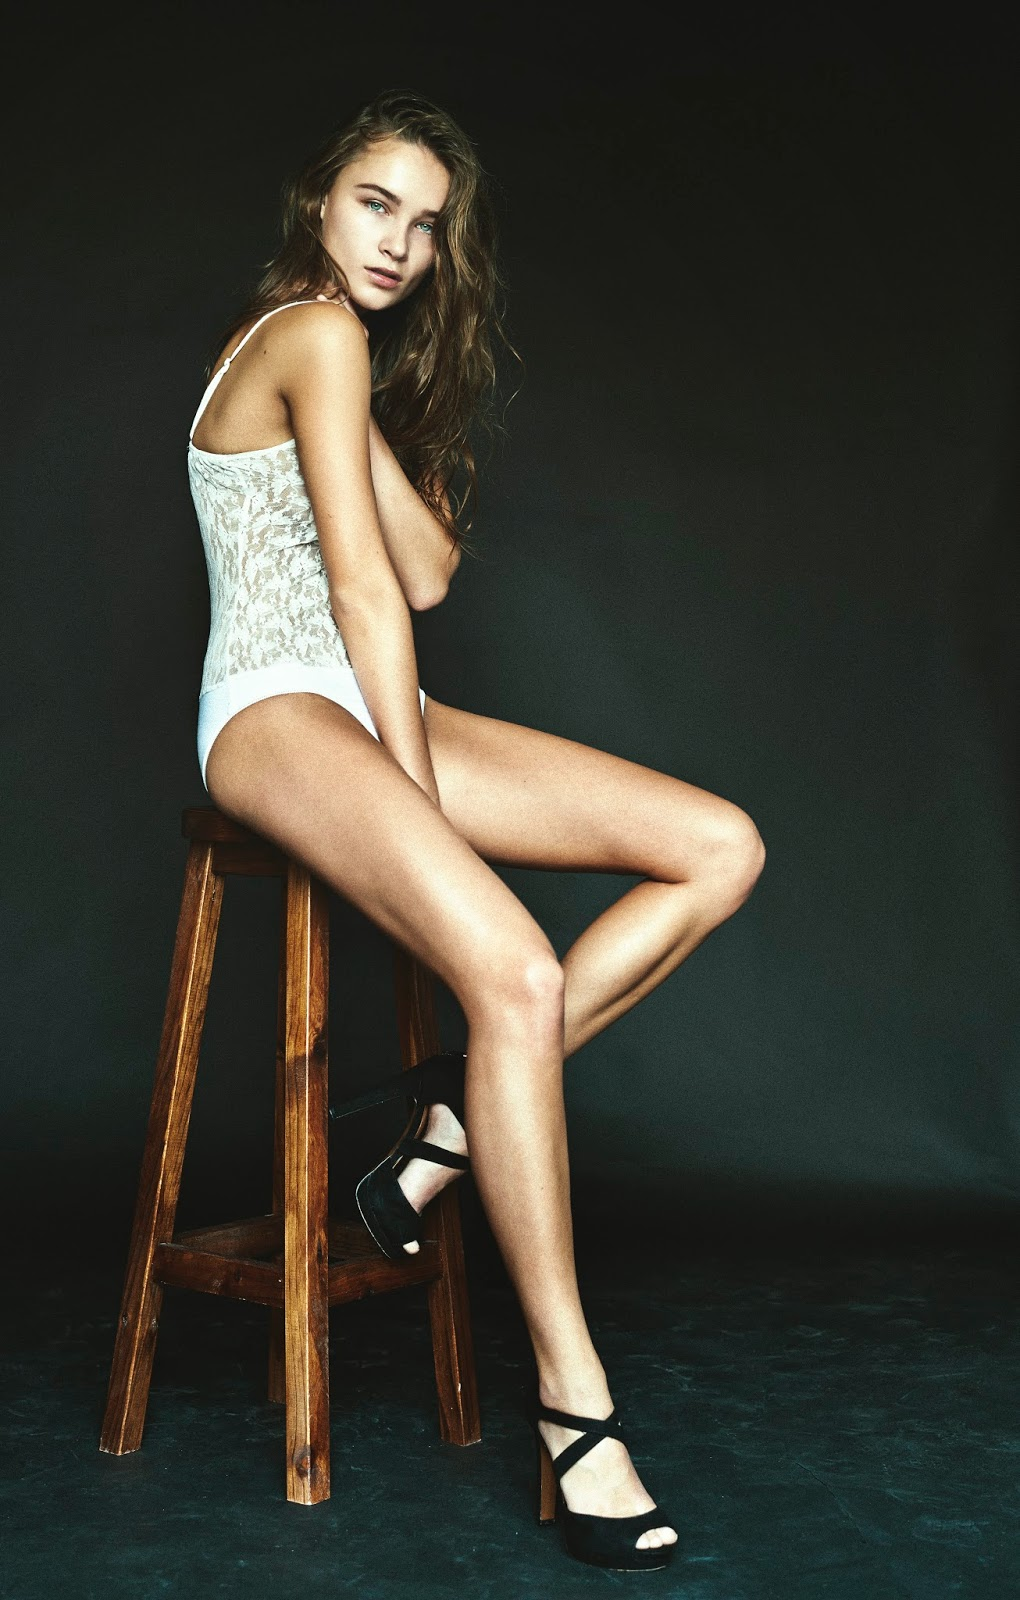 Images Anastasiya Primak nude photos 2019